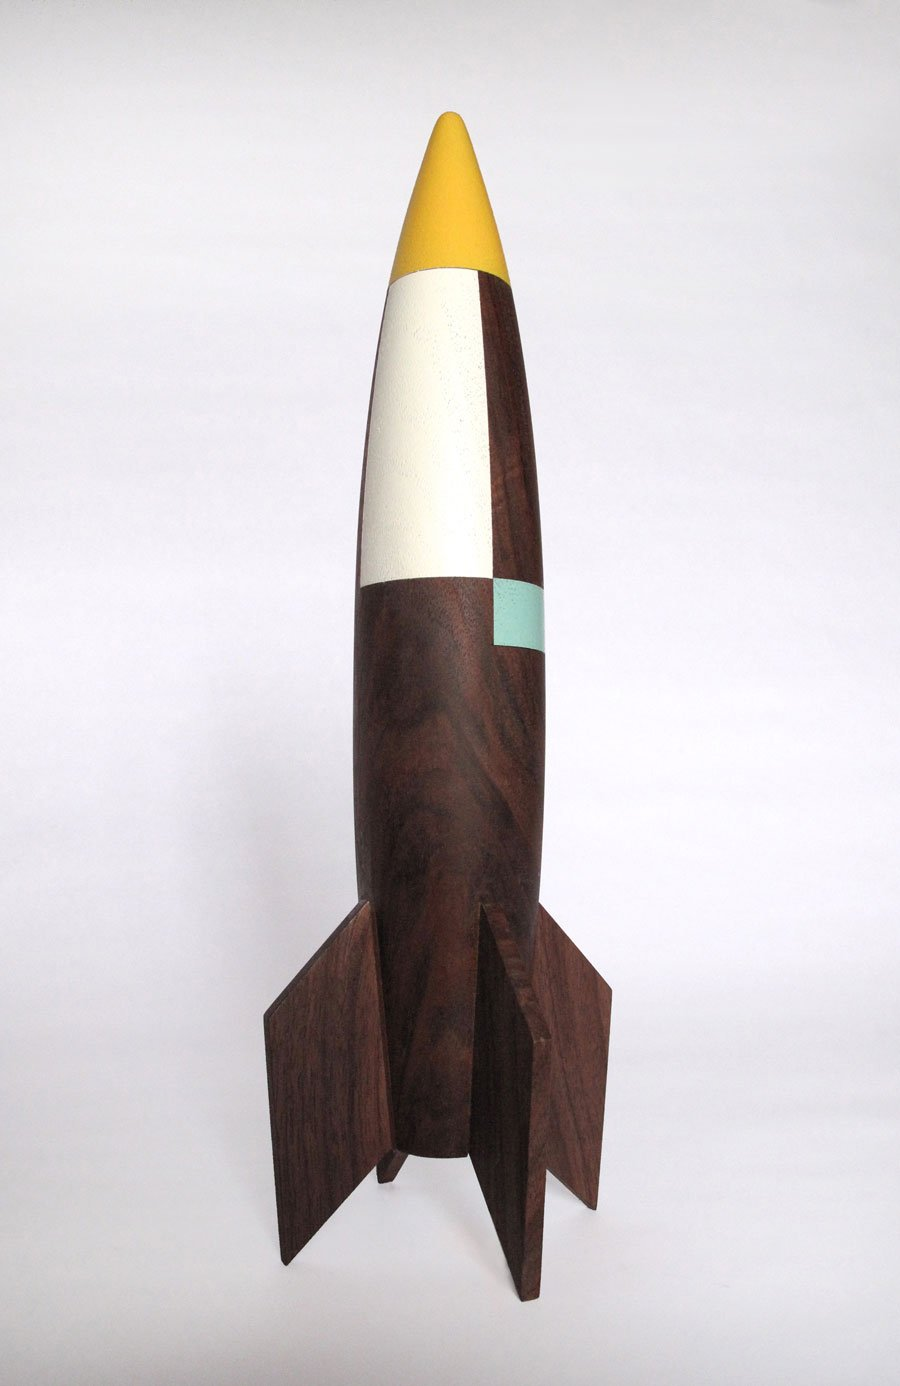 Photo 3 of 3 in Modern, Whimsical Rocket by Designer Pat Kim